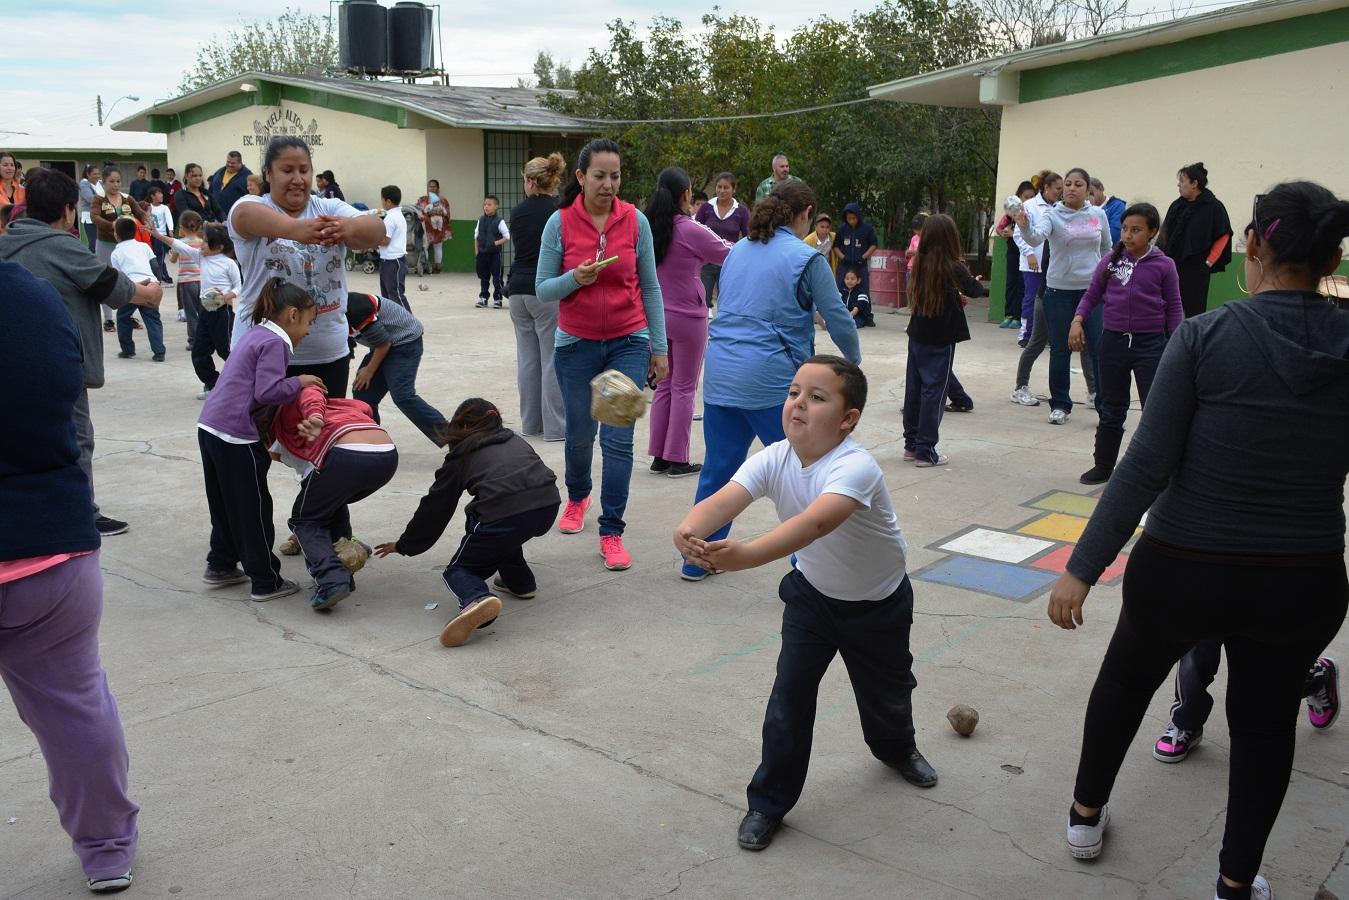 Dorable Plantilla De Curriculum De Instructor De Baile Festooning ...